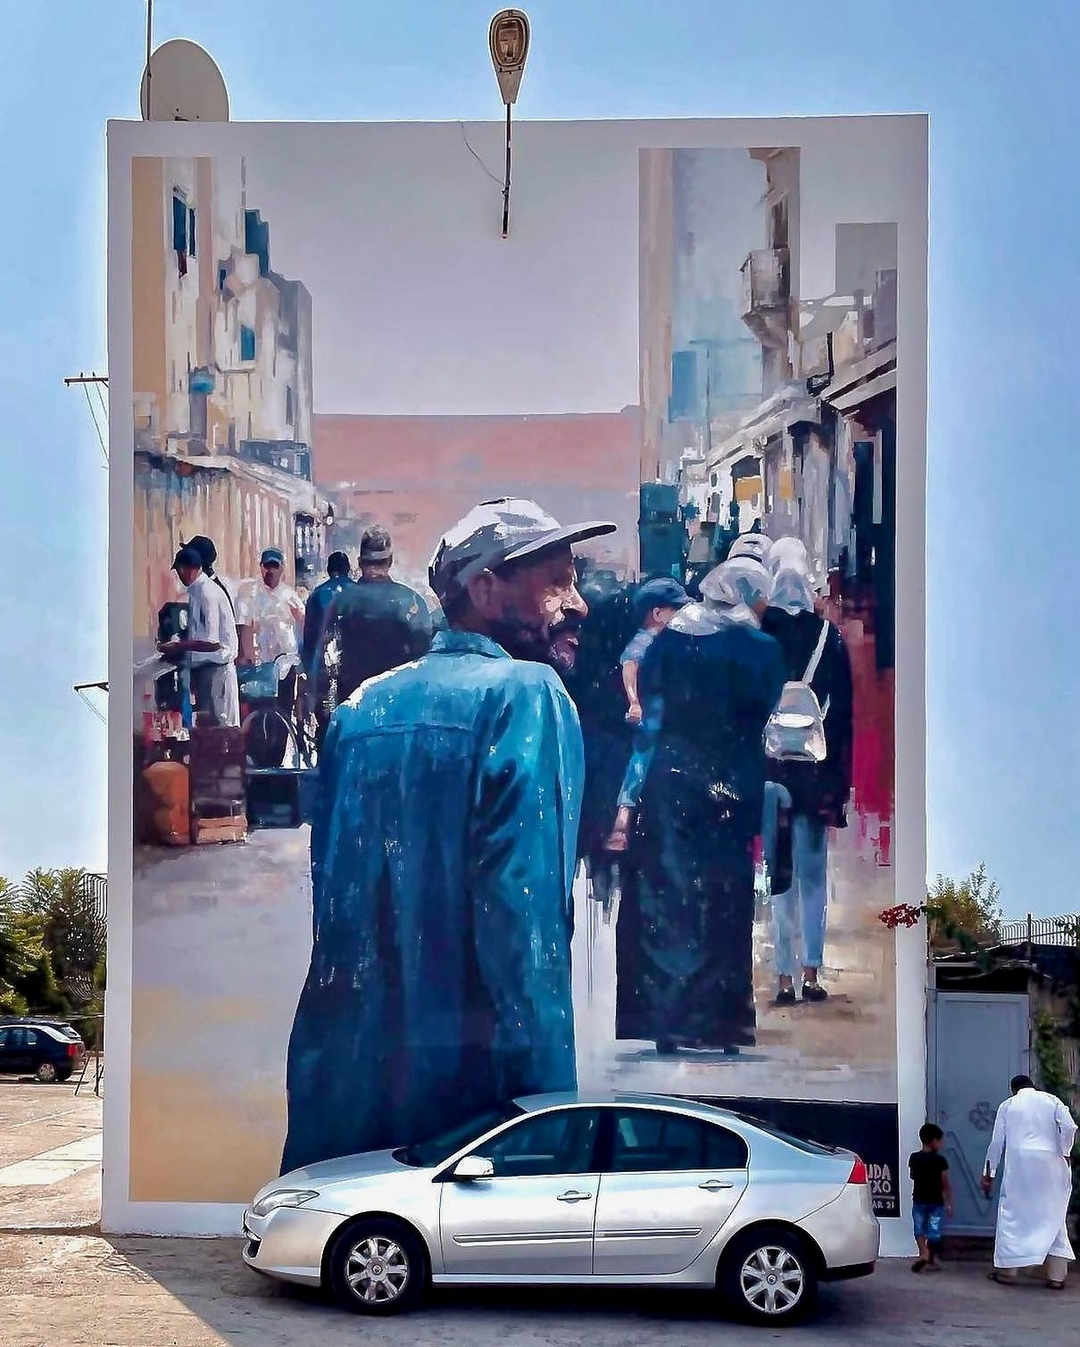 Udatxo @ Rabat, Morocco